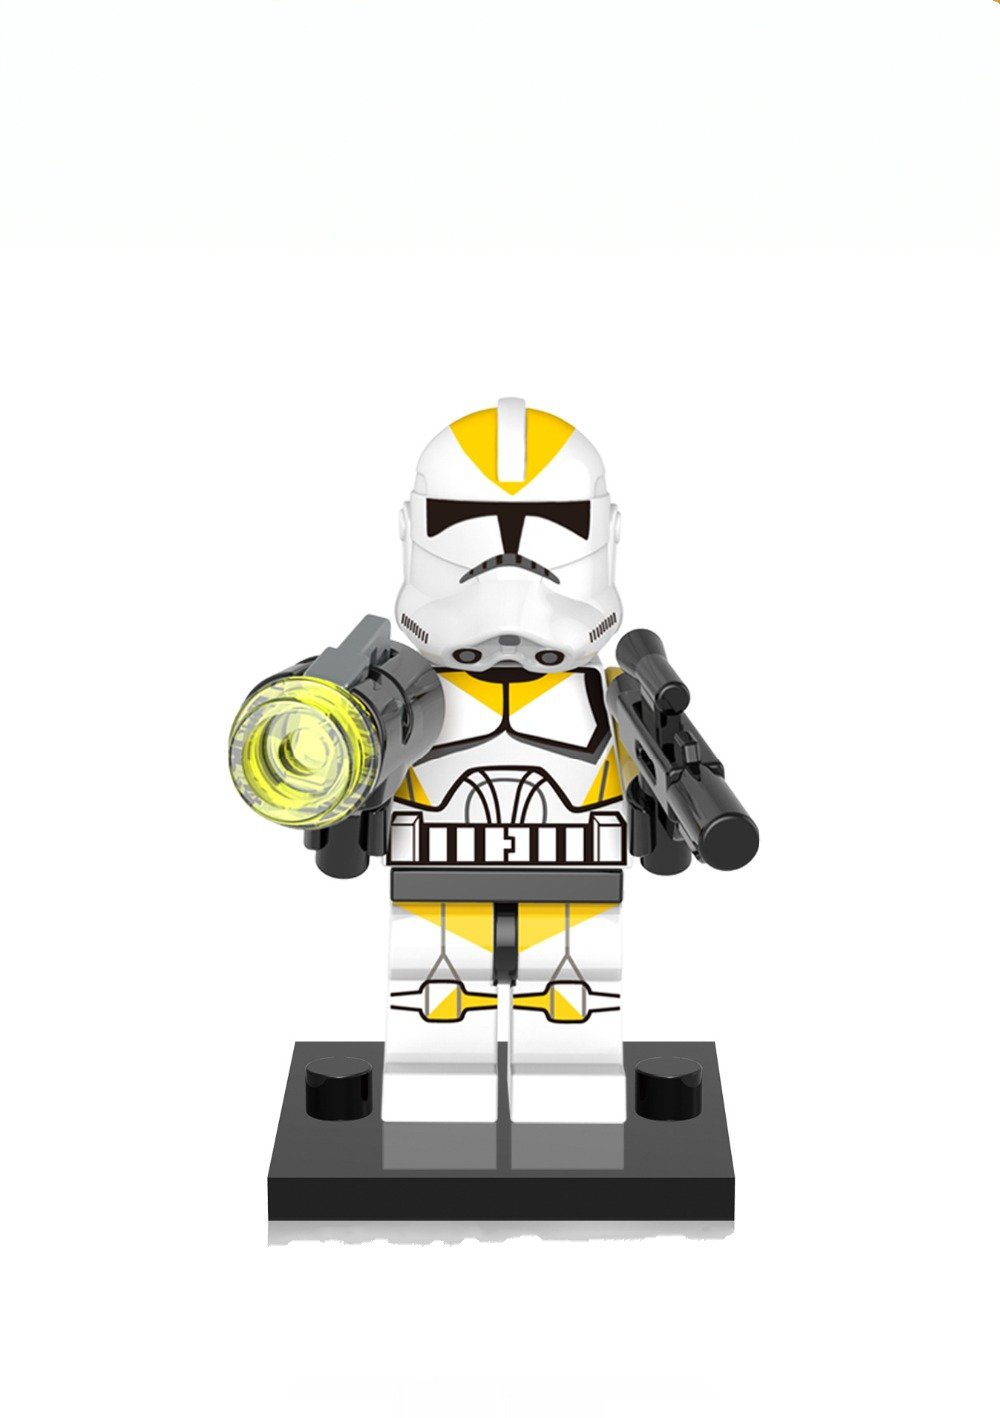 Yellow Utapau Clone Trooper Star Wars Lego Minifigure Compatible Toy